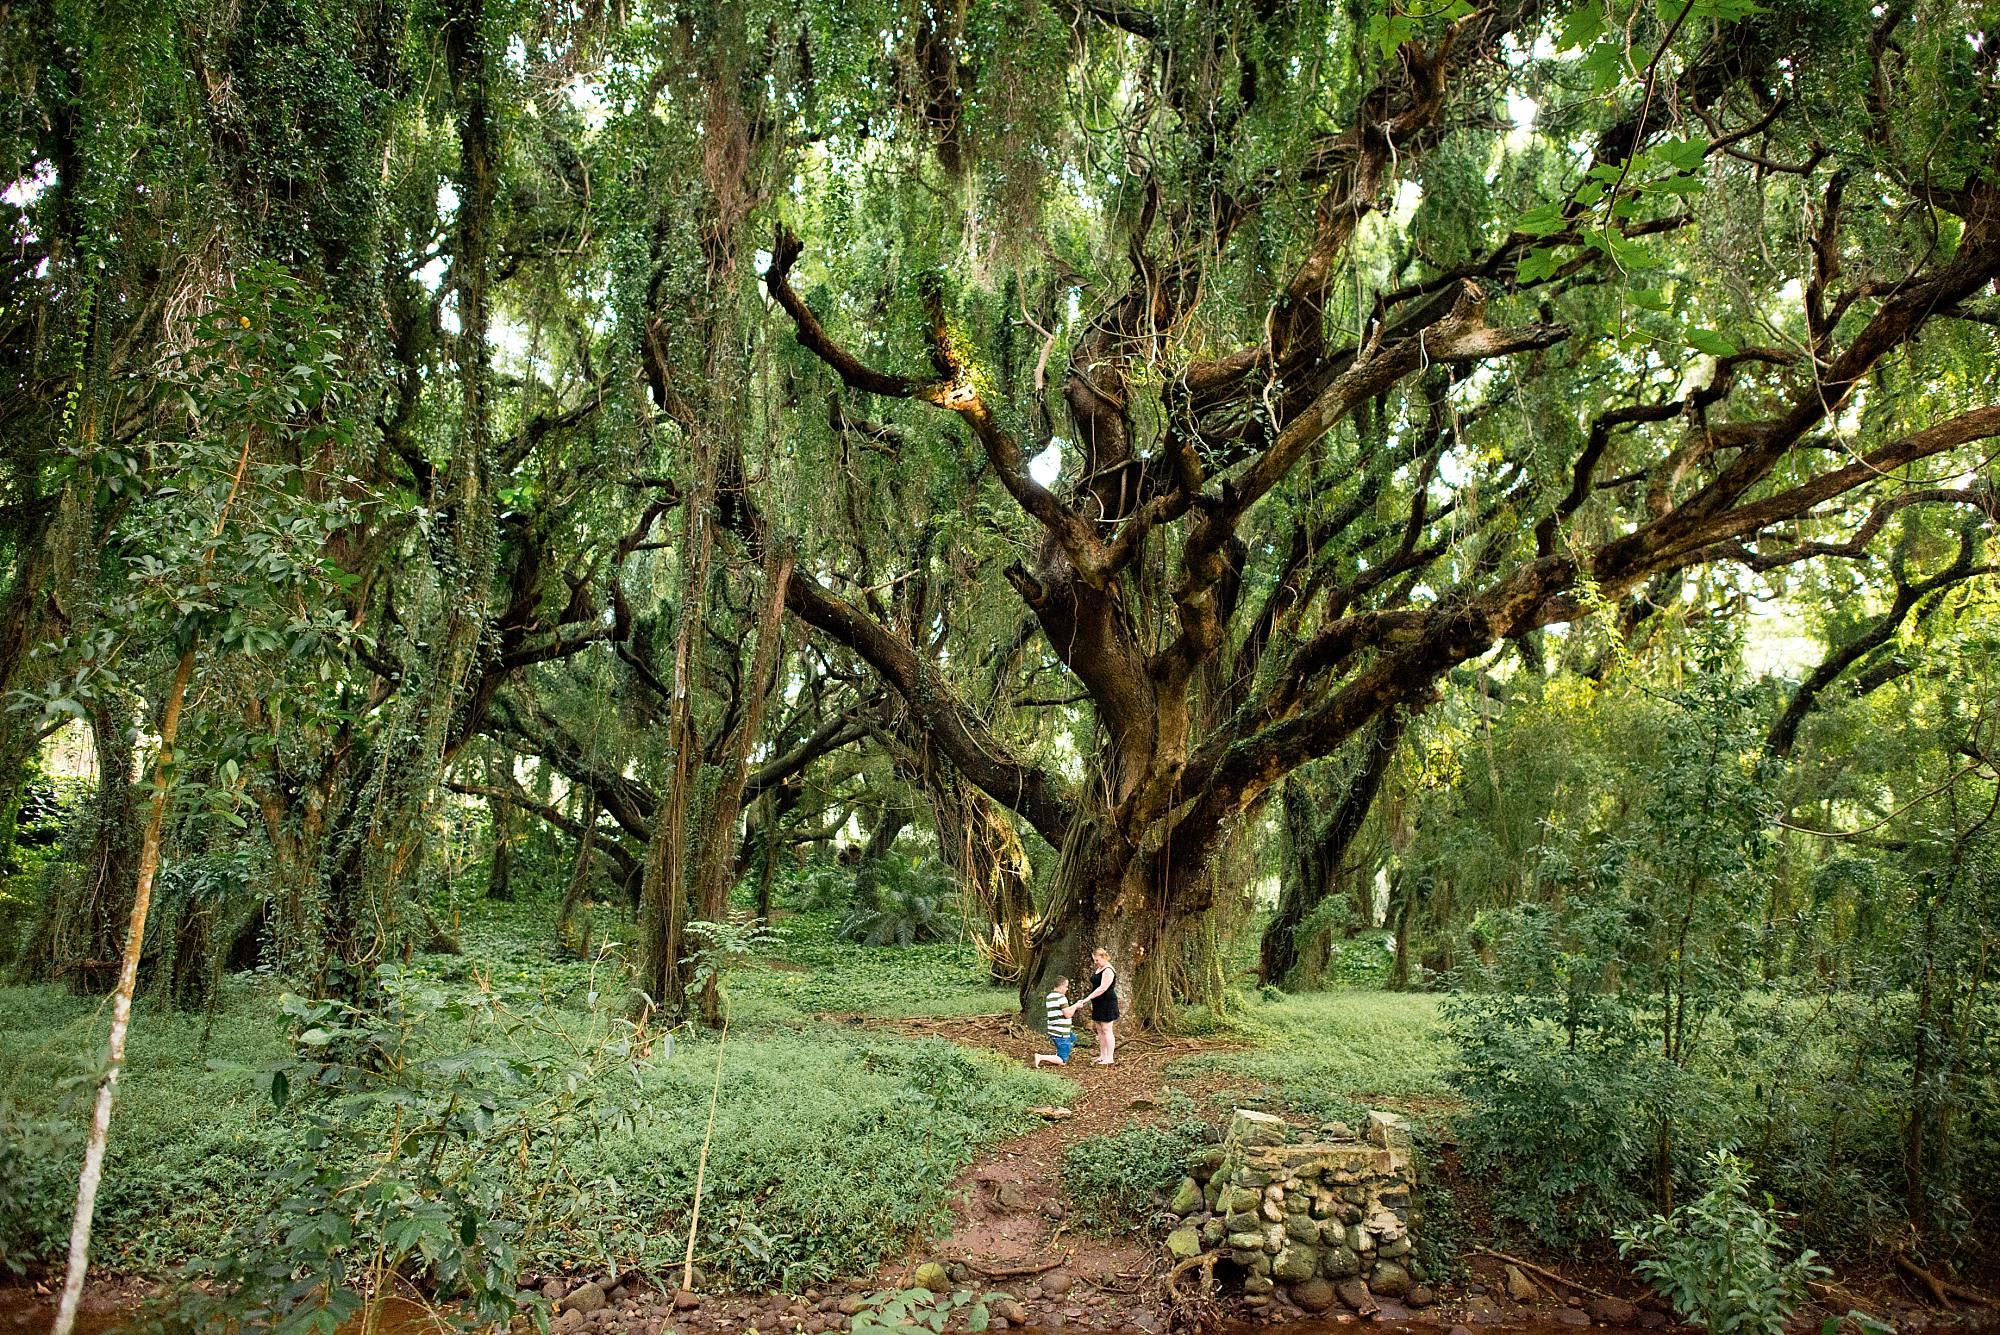 man proposing in front of big banyan tree